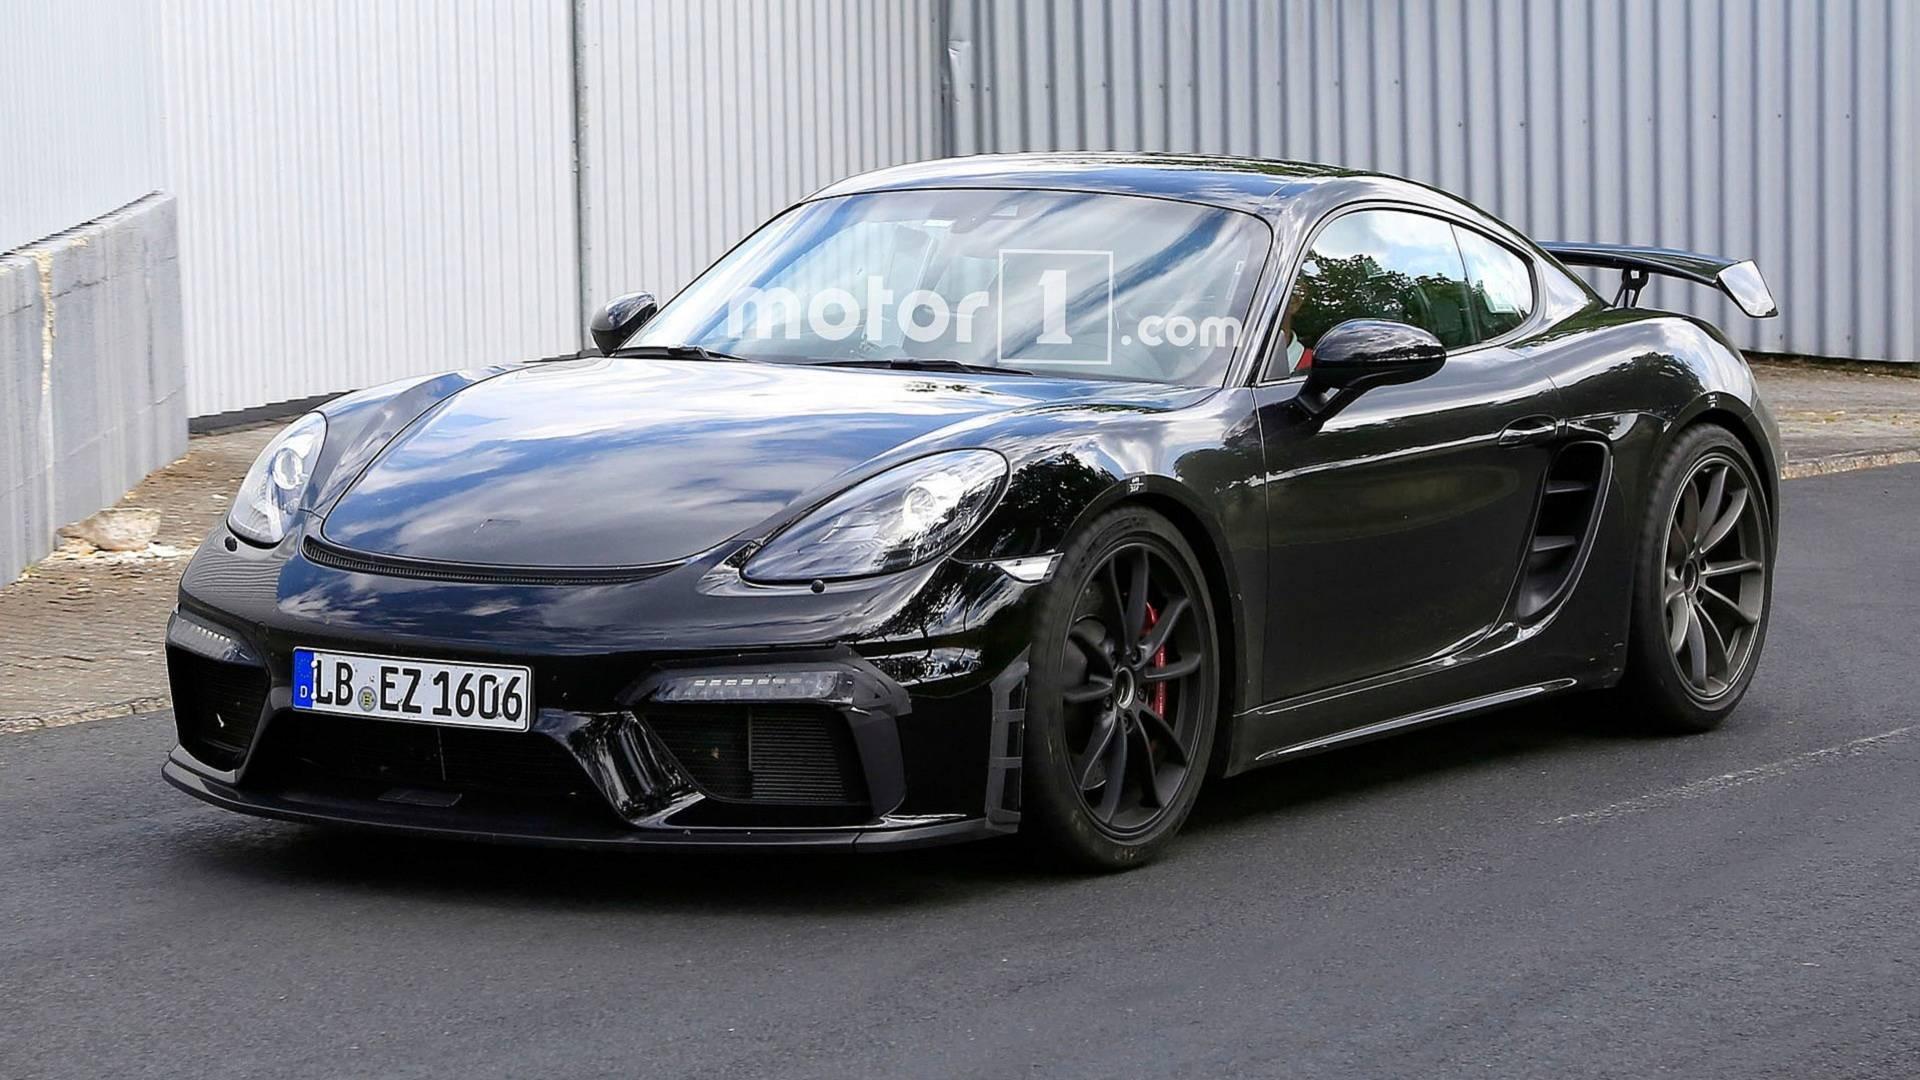 2016 - [Porsche] 718 Boxster & 718 Cayman [982] - Page 7 2019-porsche-718-cayman-gt4-spy-photo